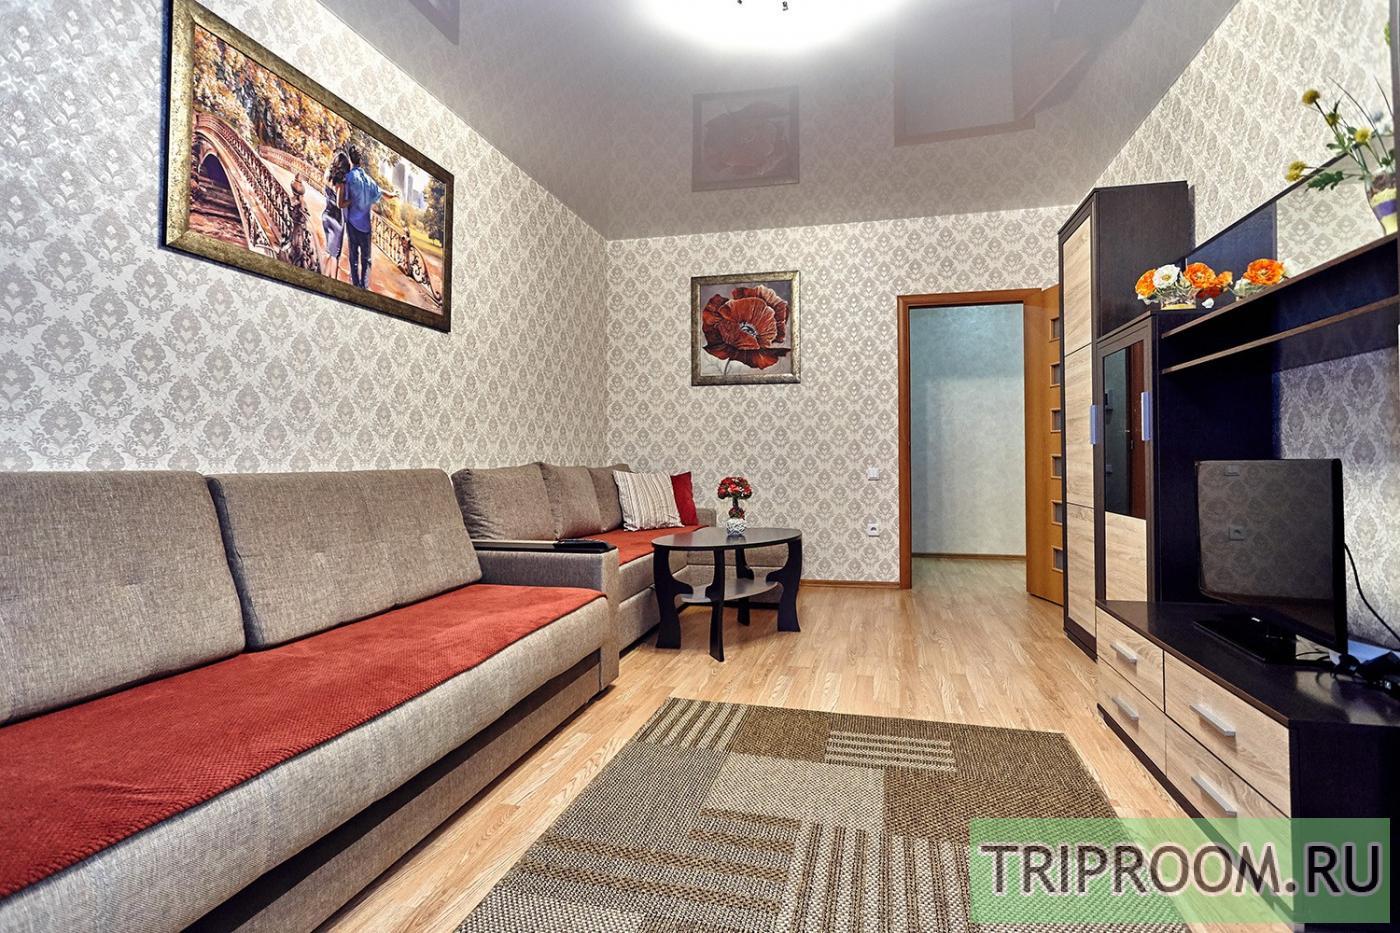 2-комнатная квартира посуточно (вариант № 10581), ул. Соколова улица, фото № 5